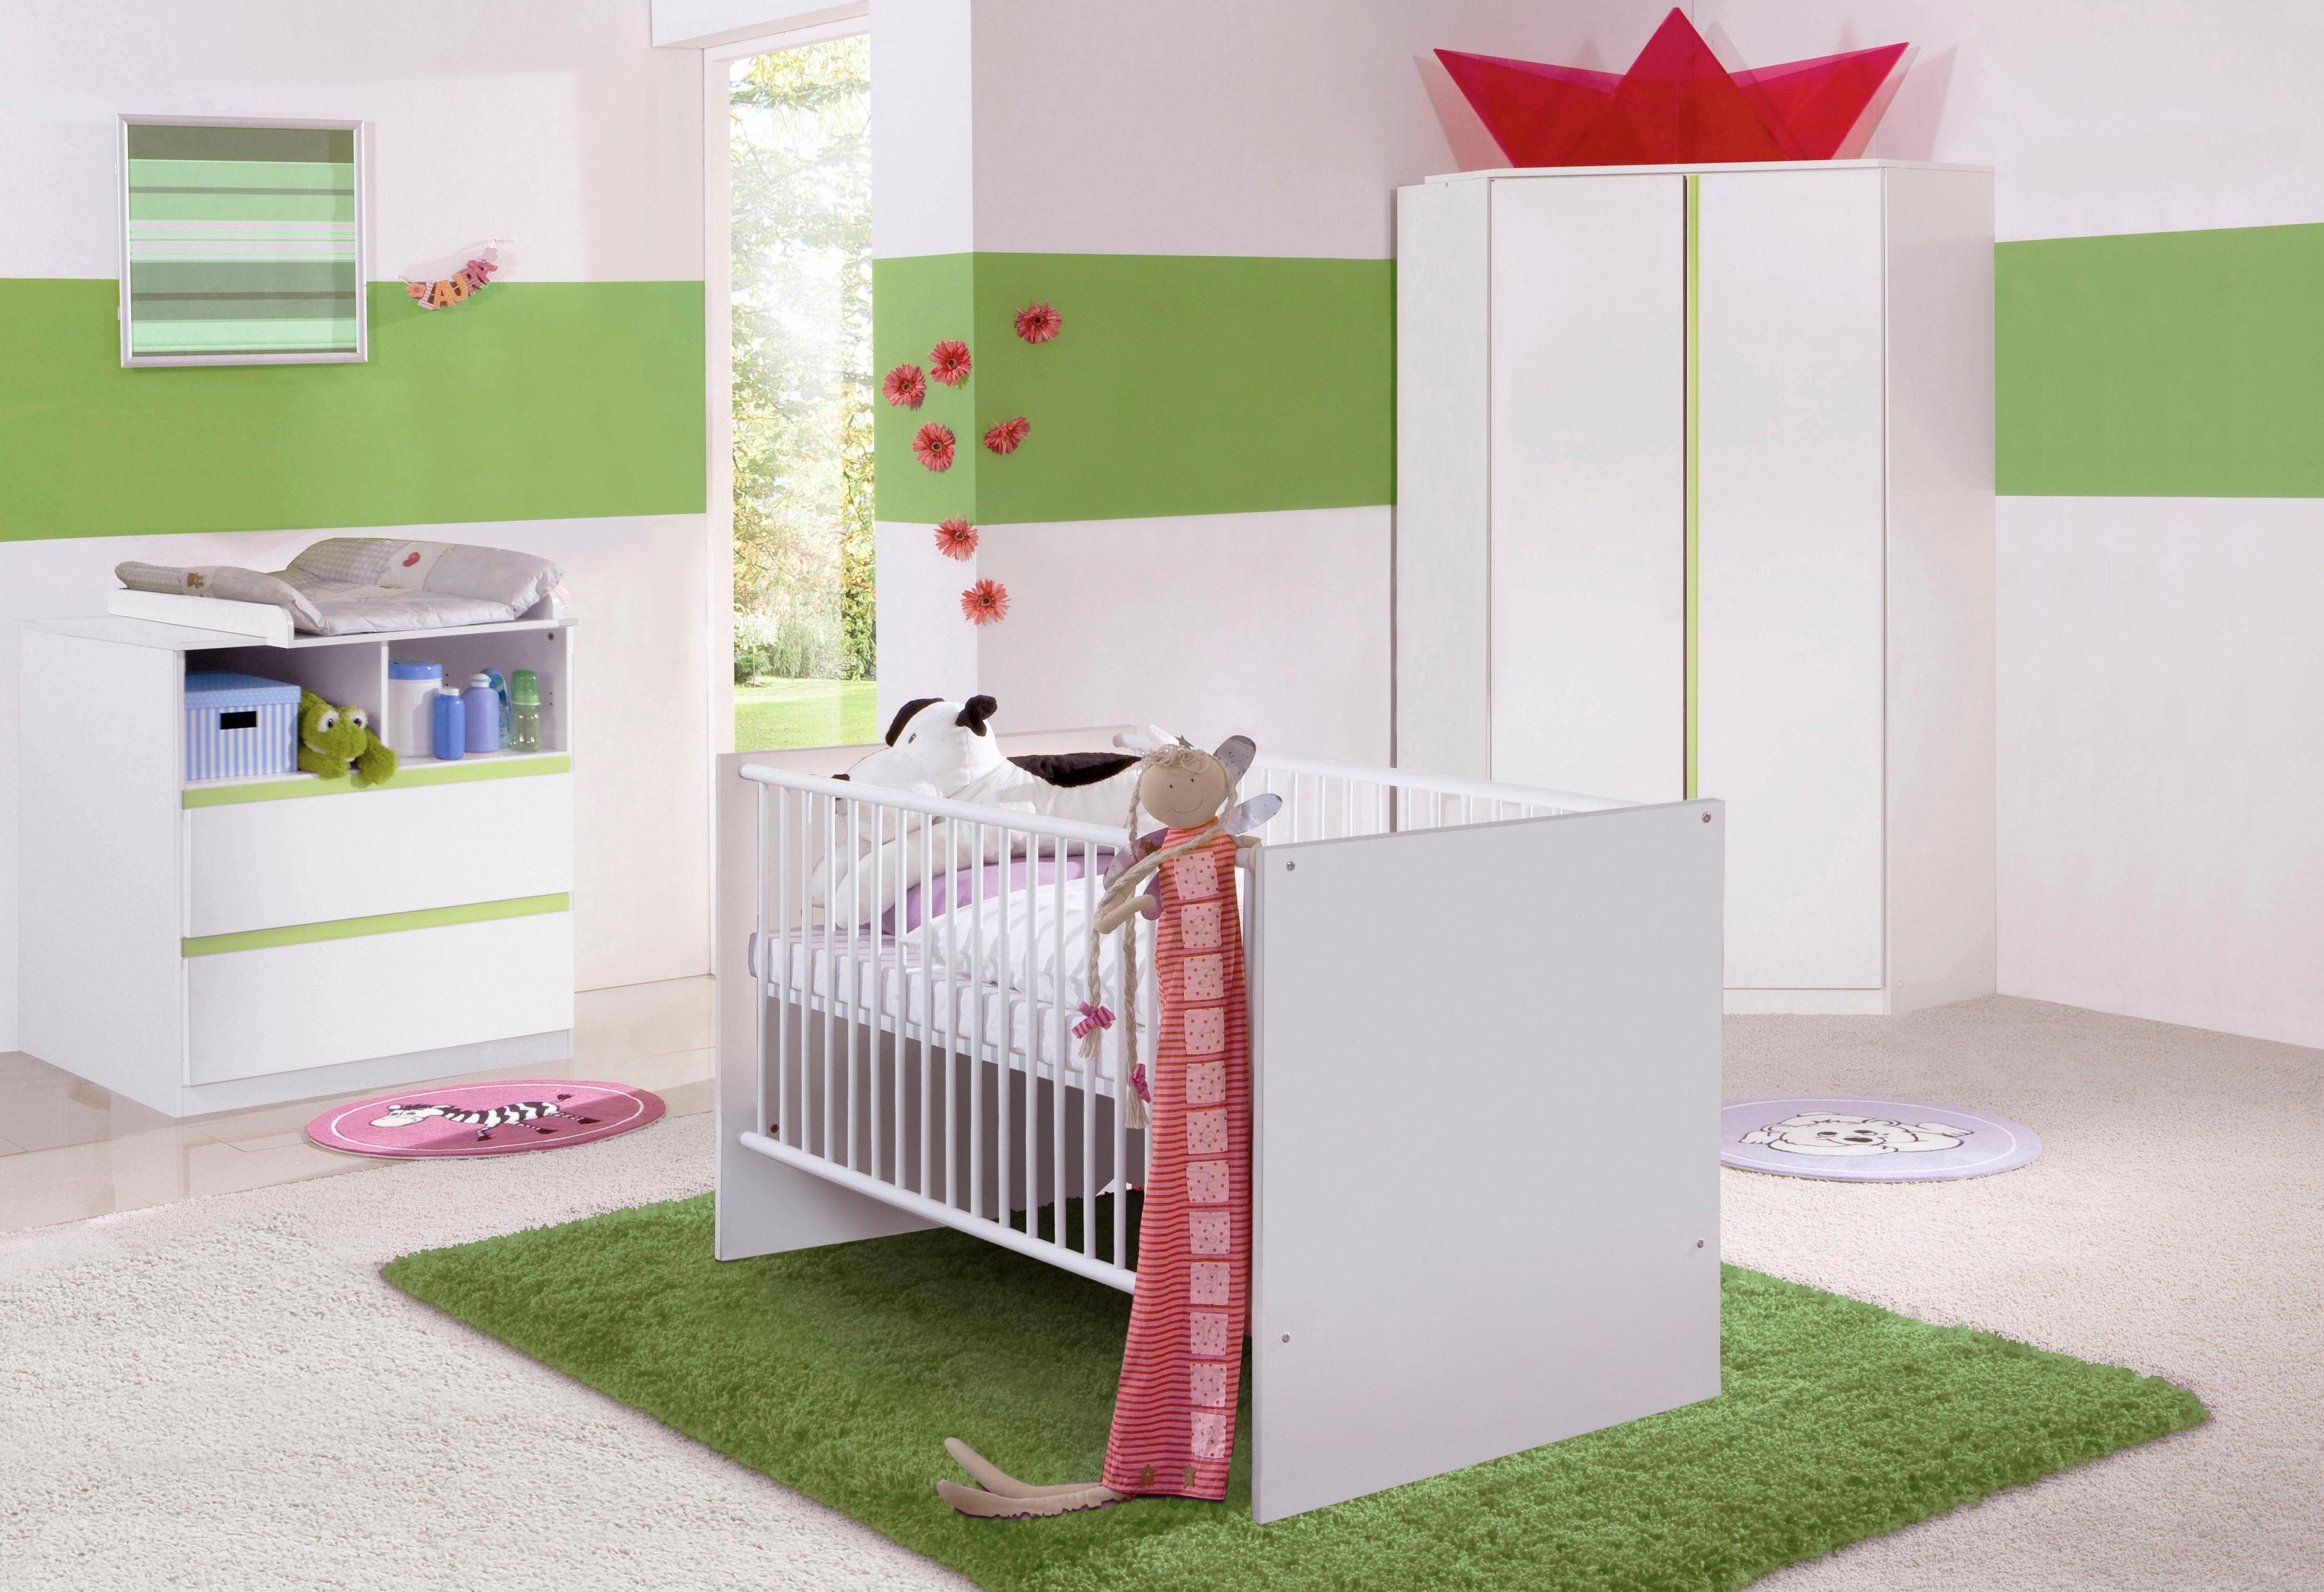 Komplett Babyzimmer »Rimini« Babybett + Wickelkommode + Eckschrank, (3-tlg. Set) in alpinweiß/ grün